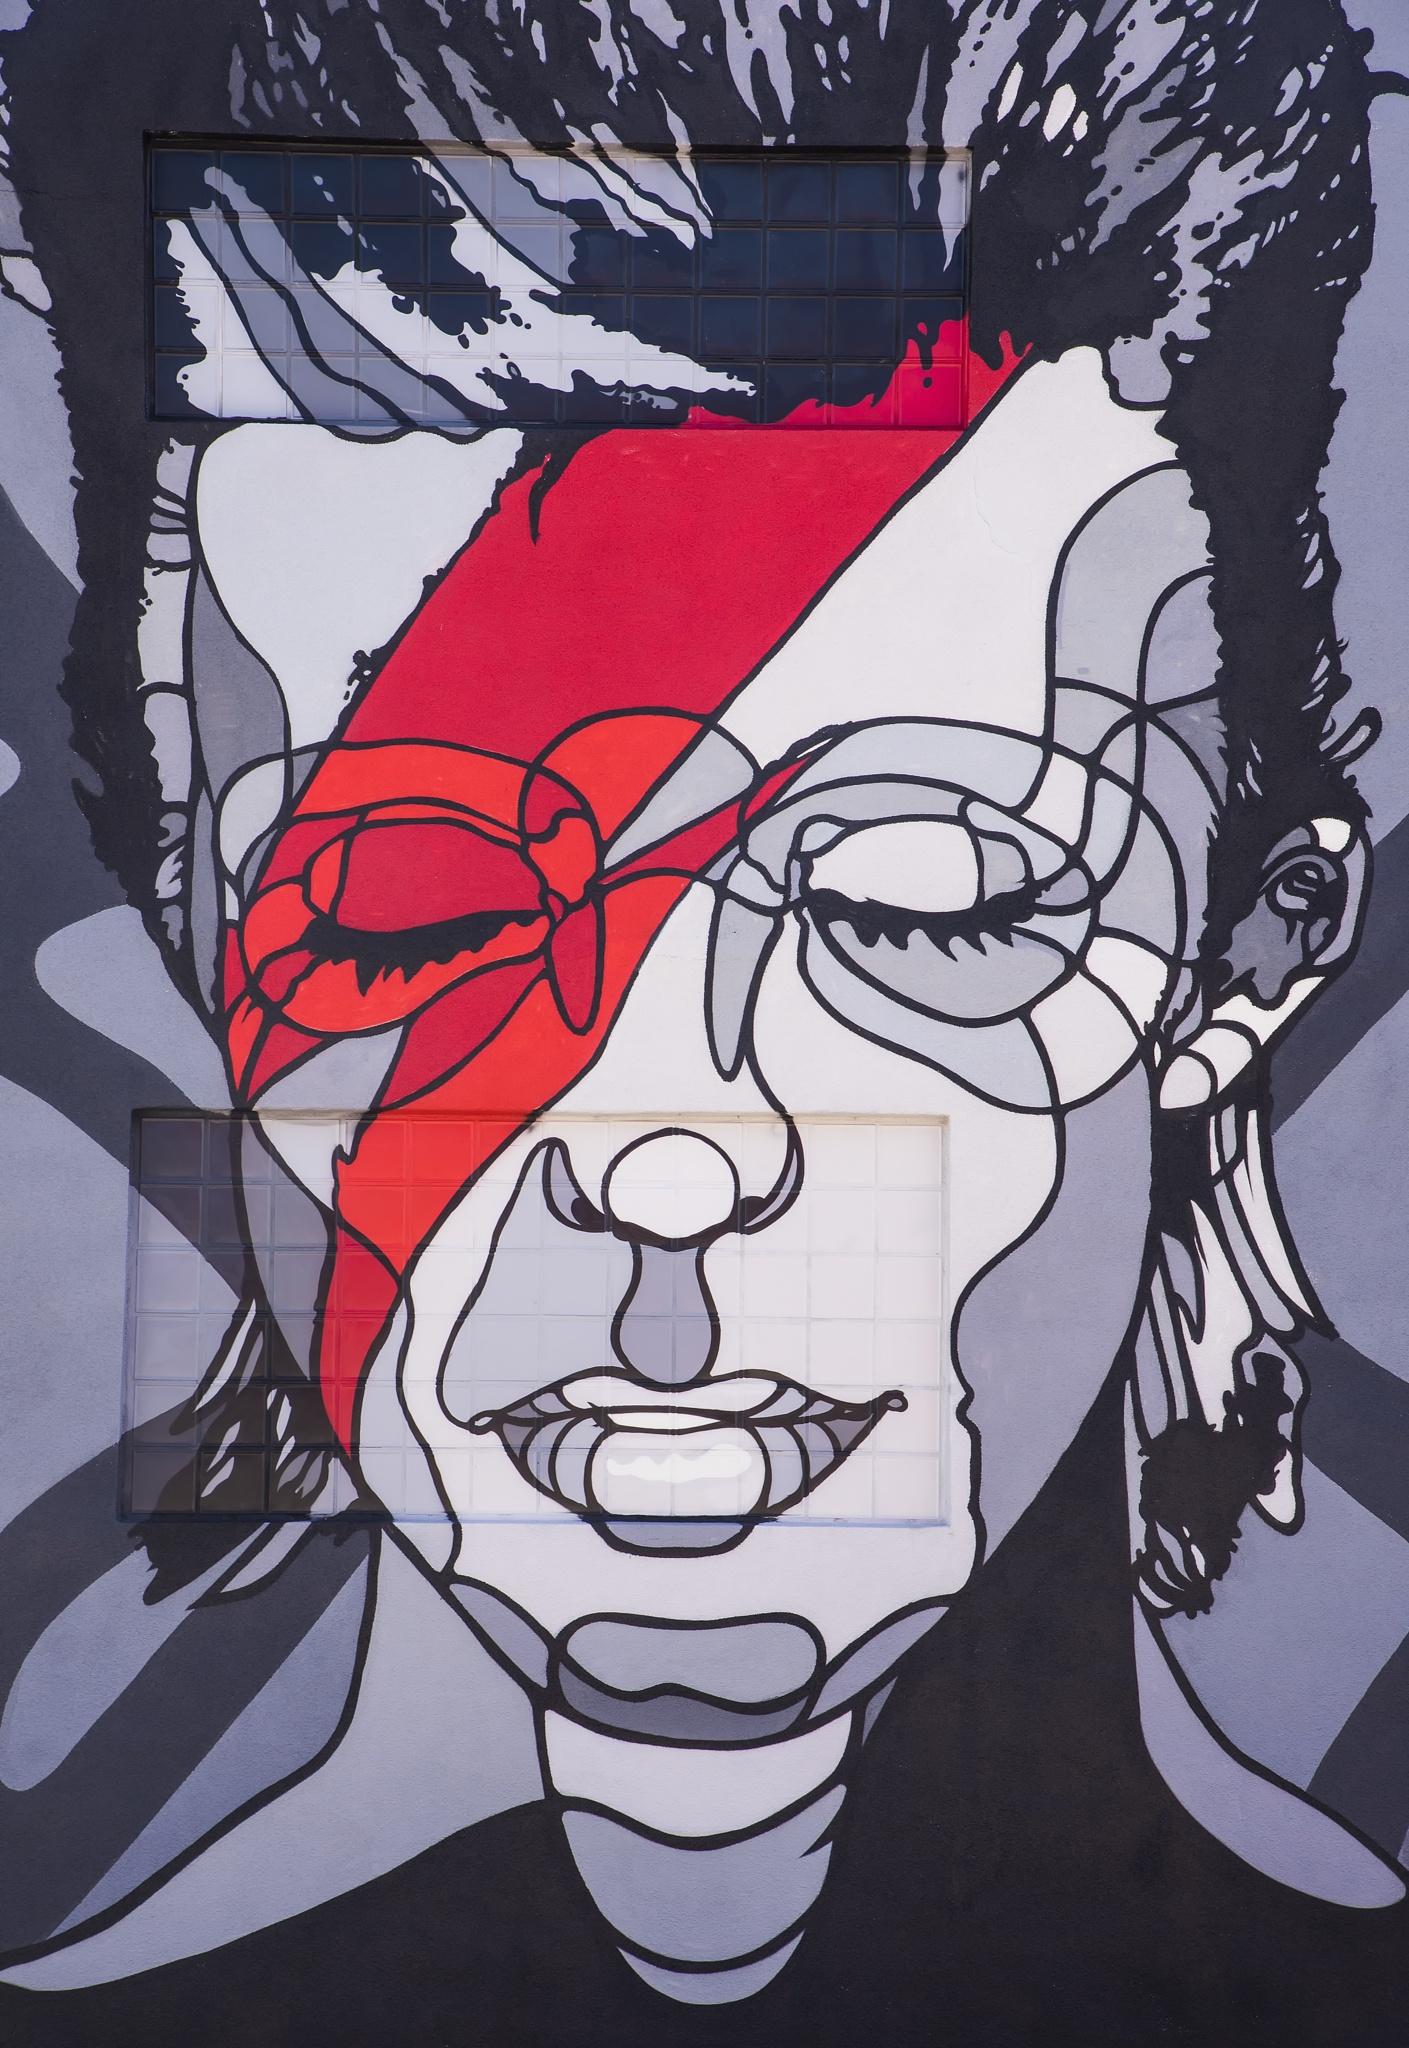 Wall Art David Bowie from Wynwood, Miami by Doctoral